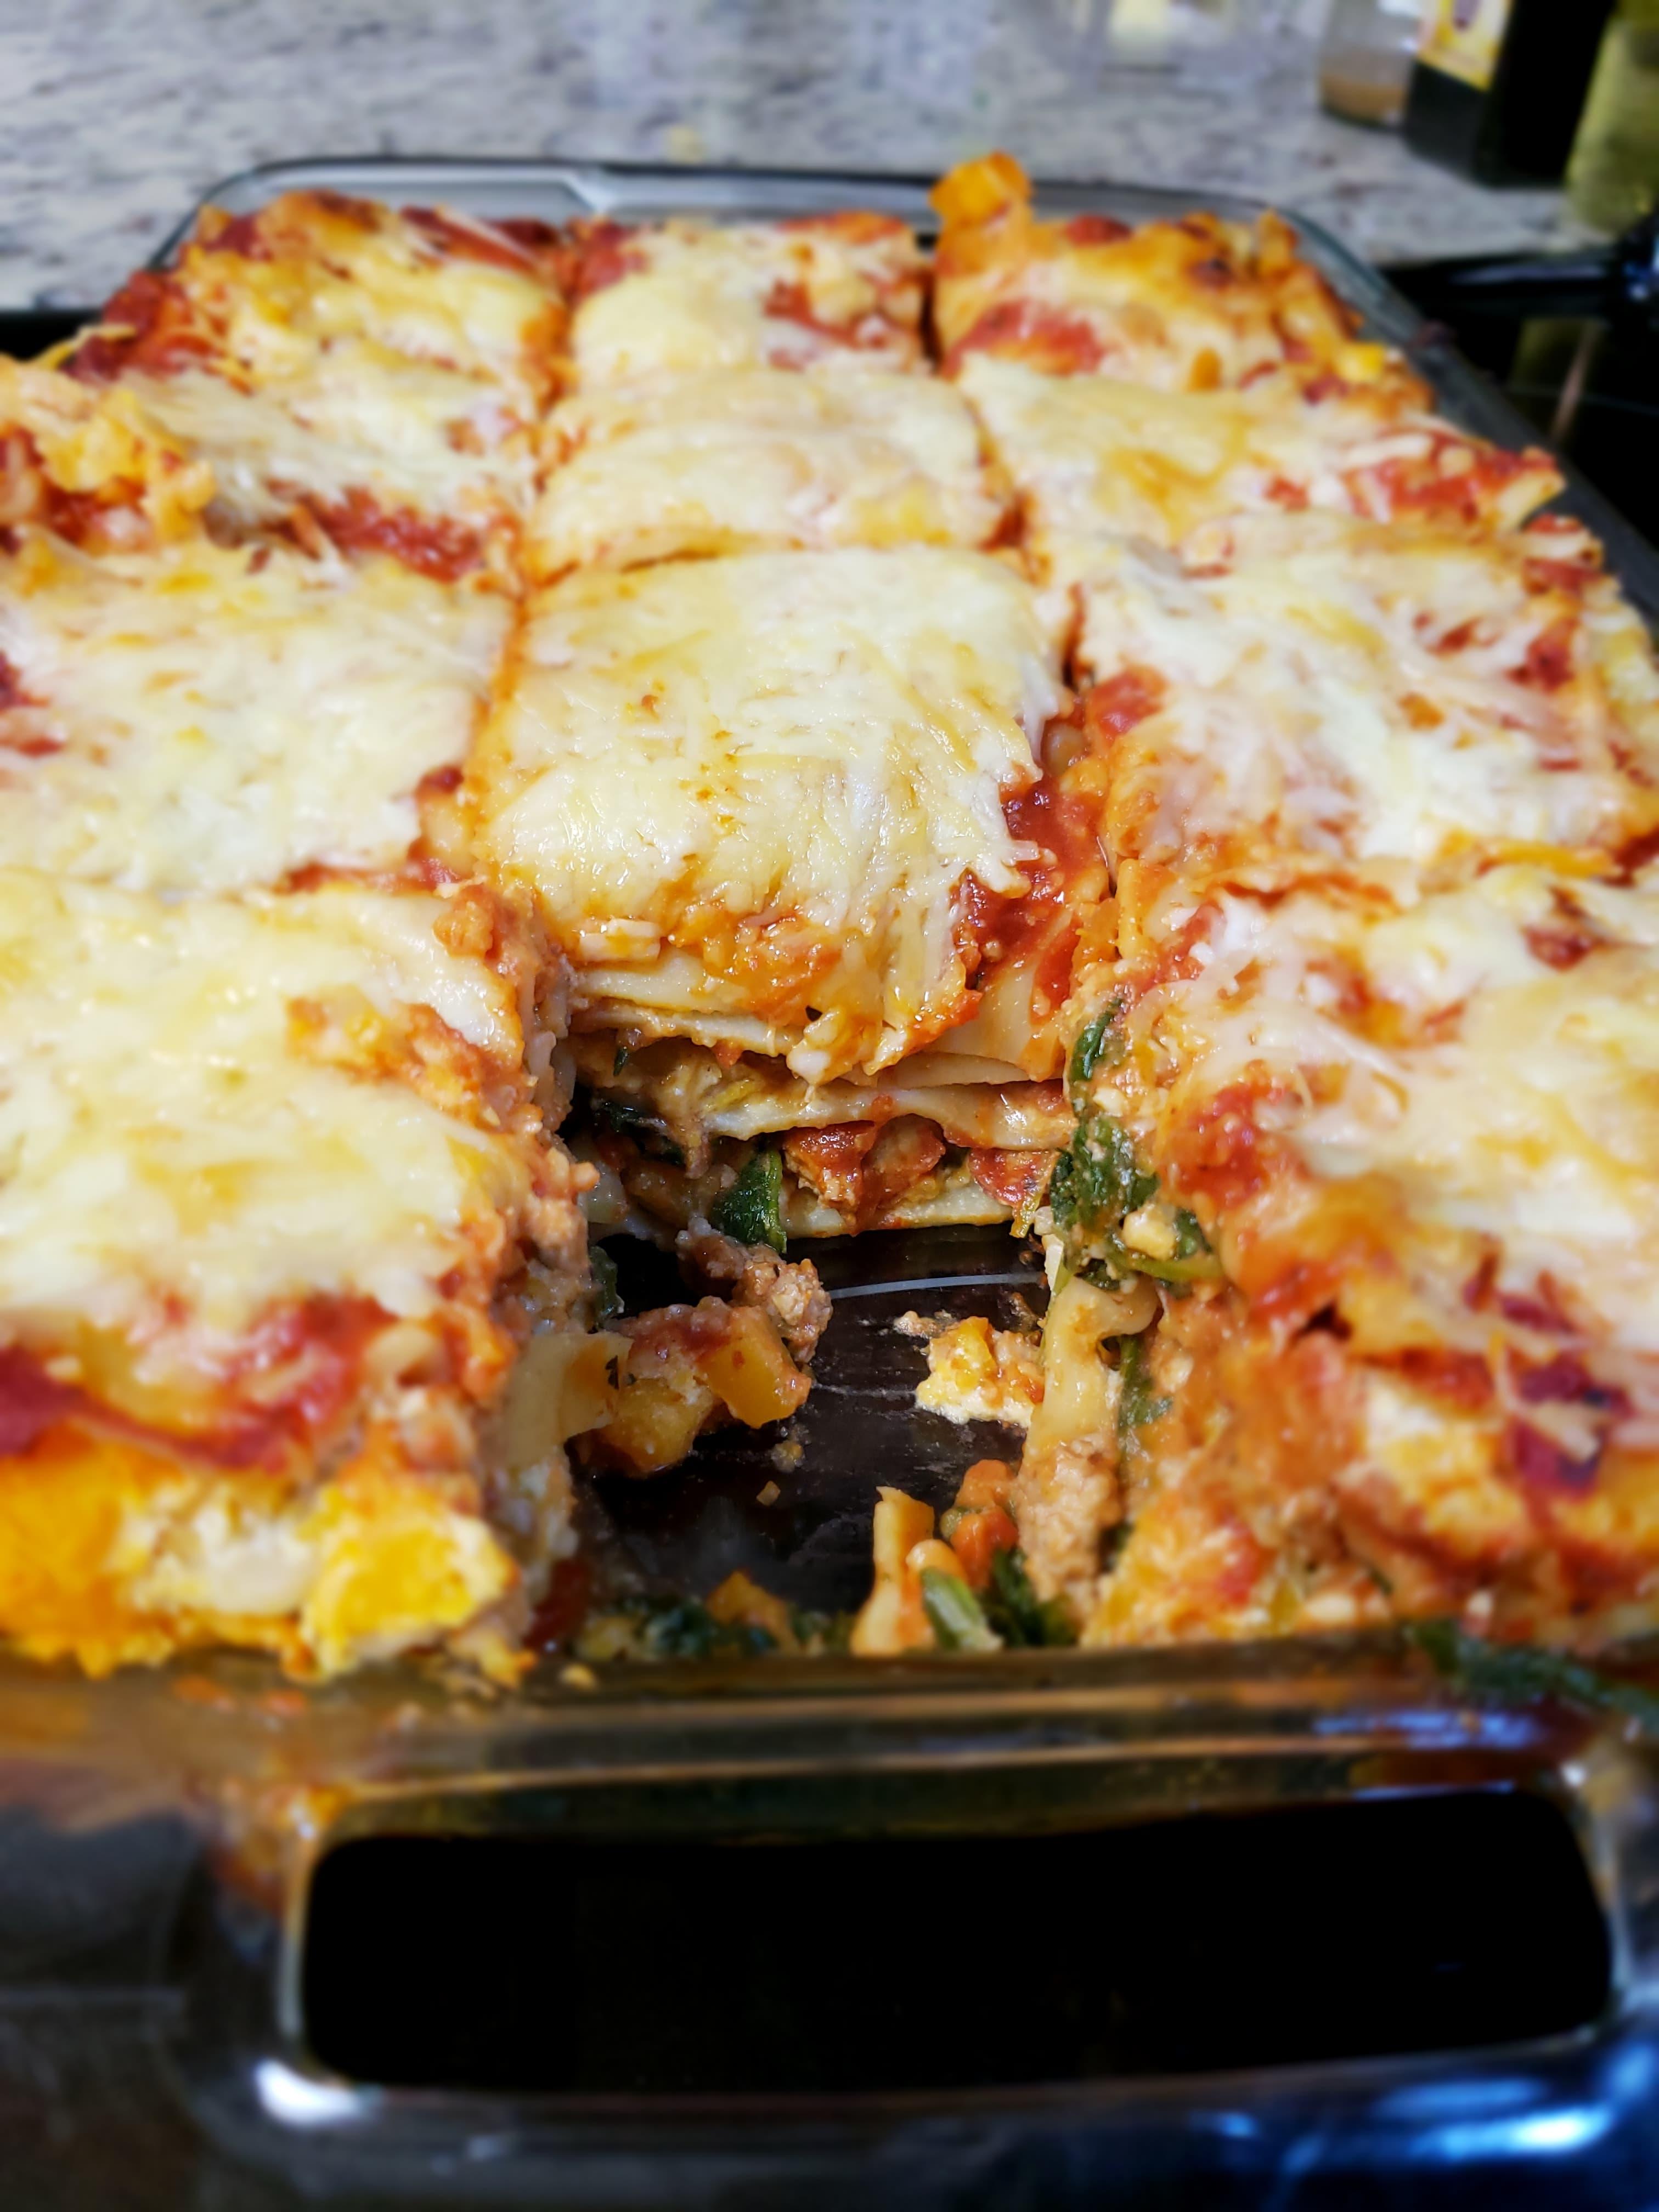 Biddy's Butternut Squash and Turkey Lasagna